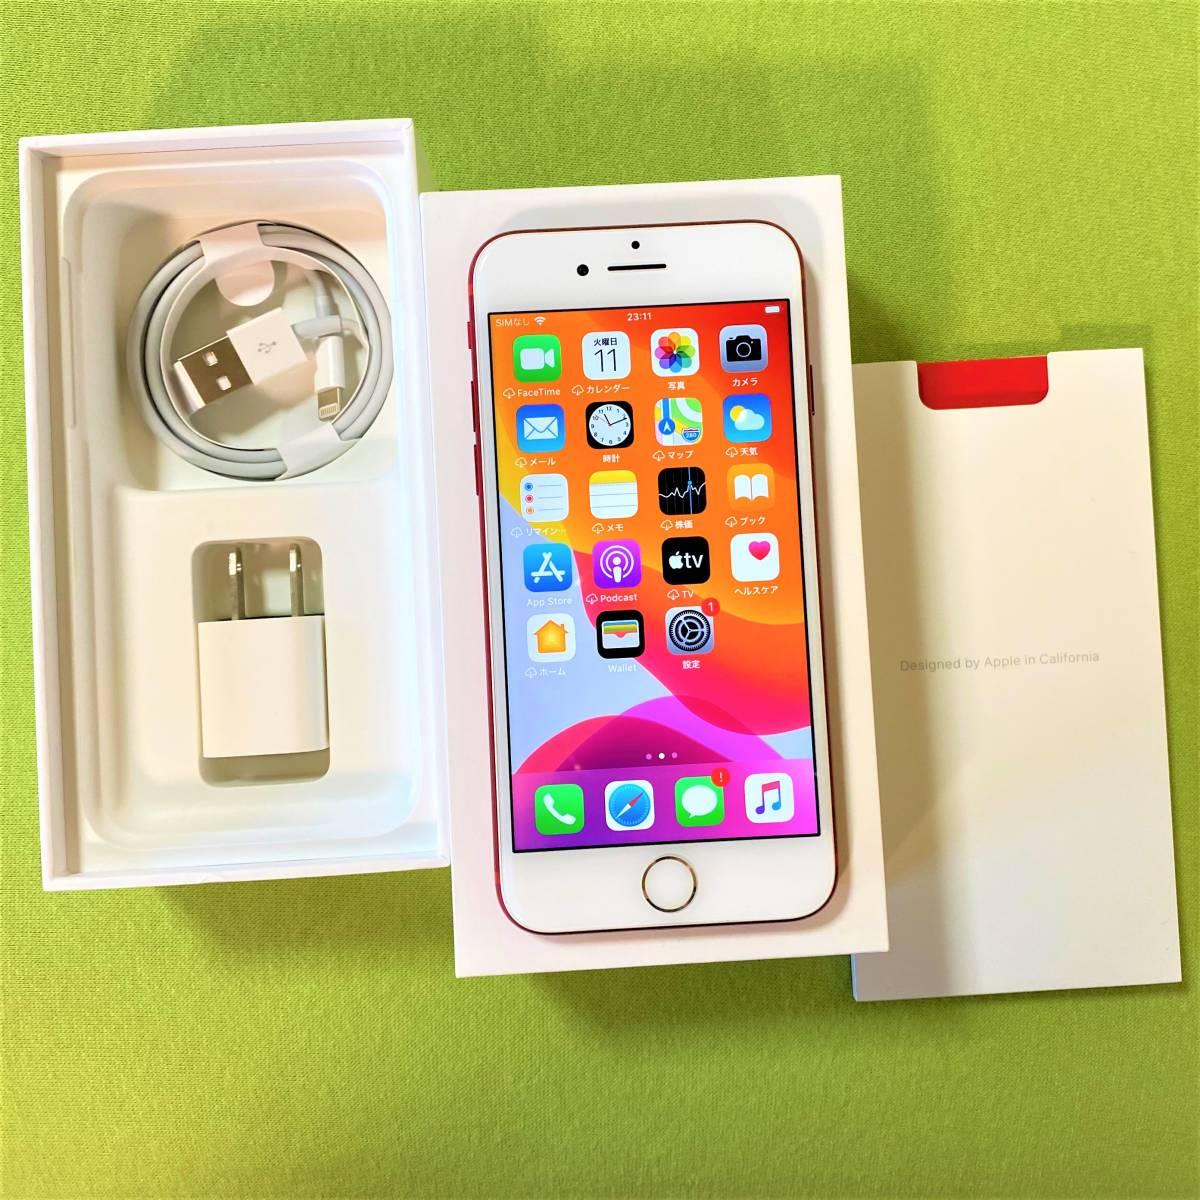 SIMフリー iPhone 7 (PRODUCT)RED Special Edition 128GB MPRX2J/A docomo 格安SIM MVNO